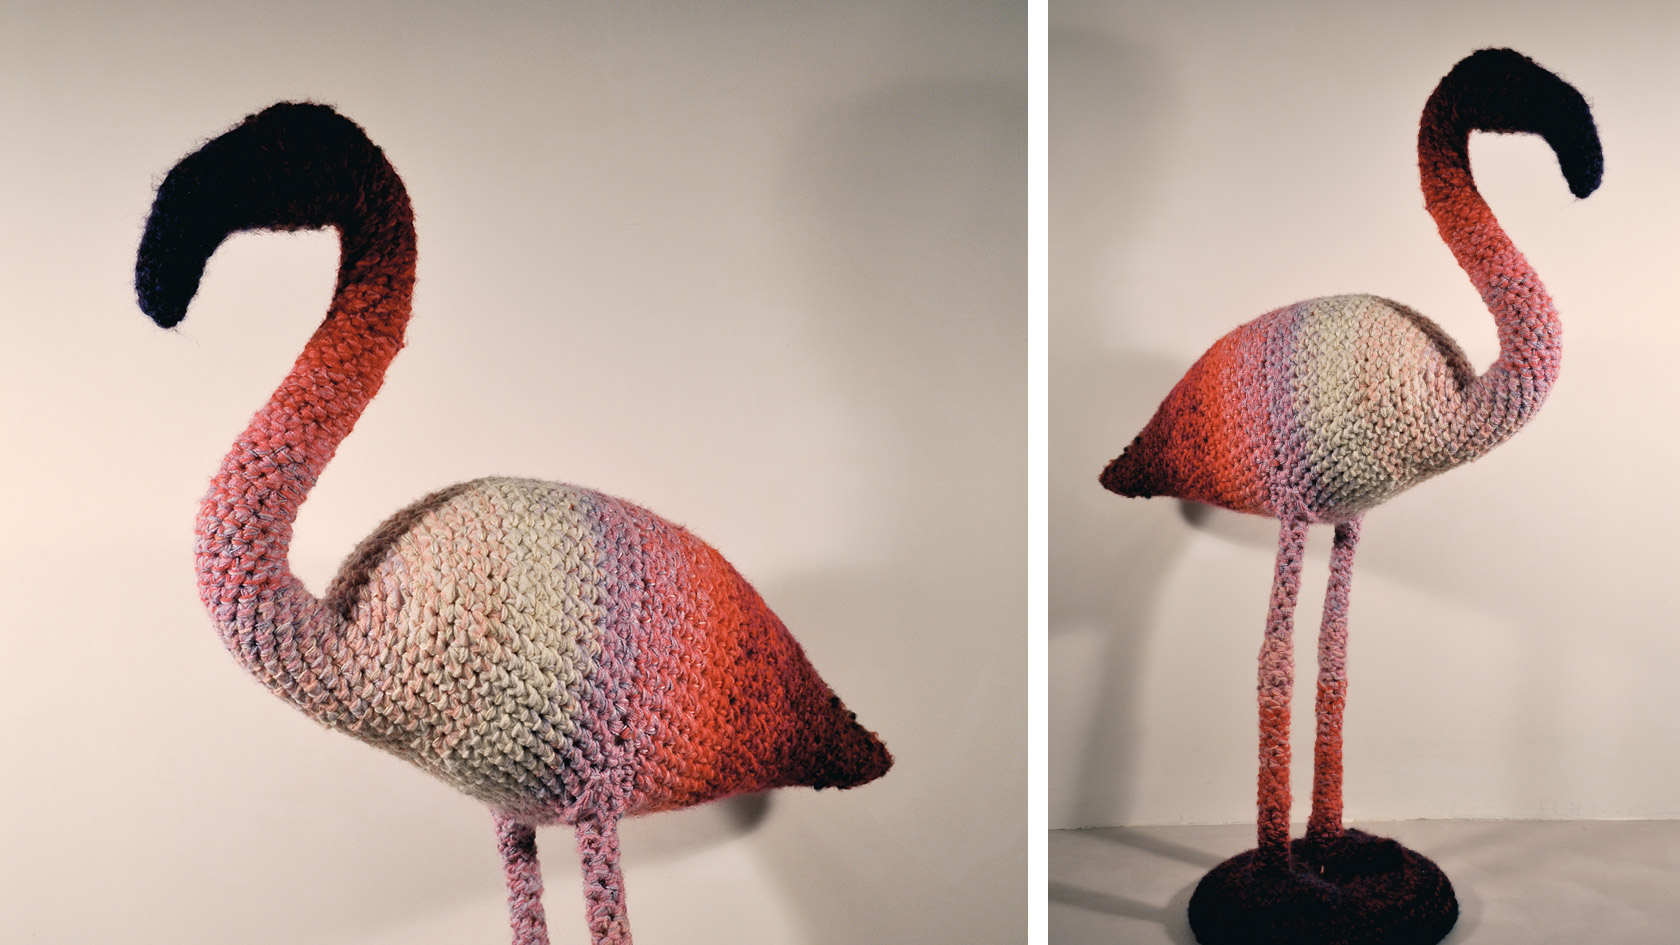 Fiamingo